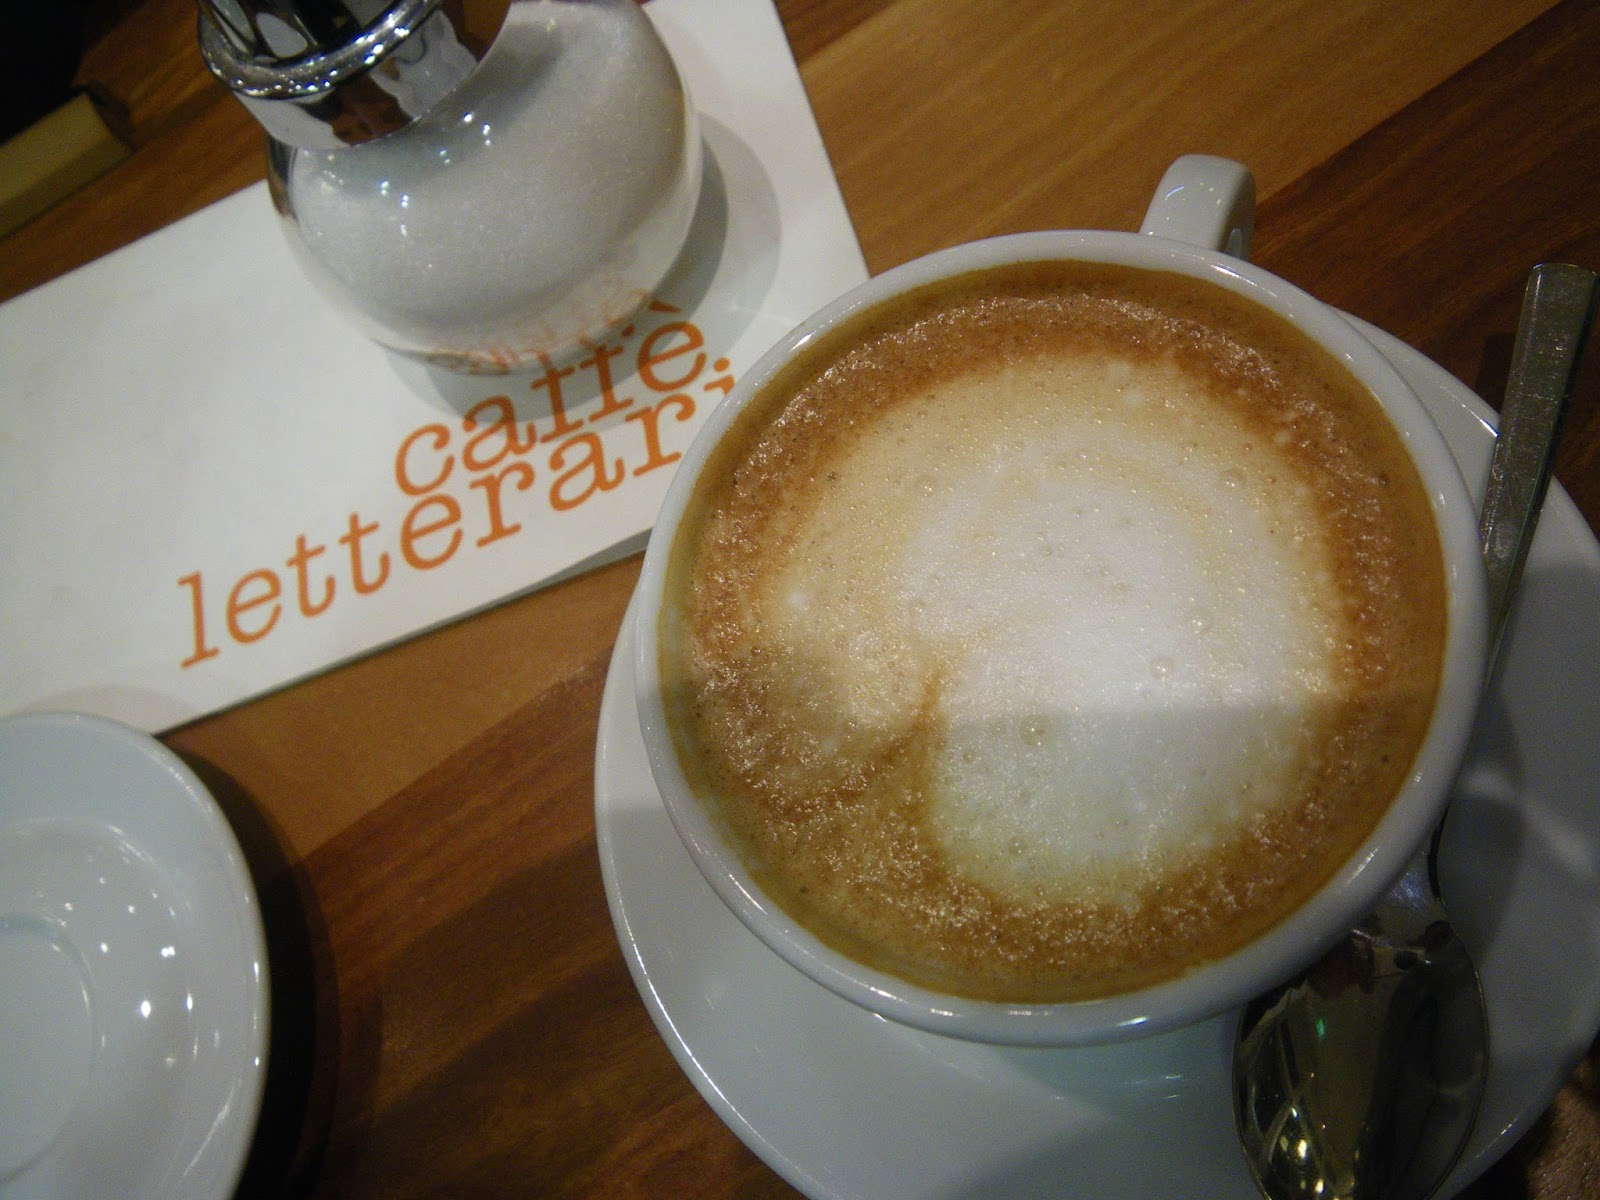 ausw rts essen regensburg auf einen cappucino im caff letterari in regensburg. Black Bedroom Furniture Sets. Home Design Ideas